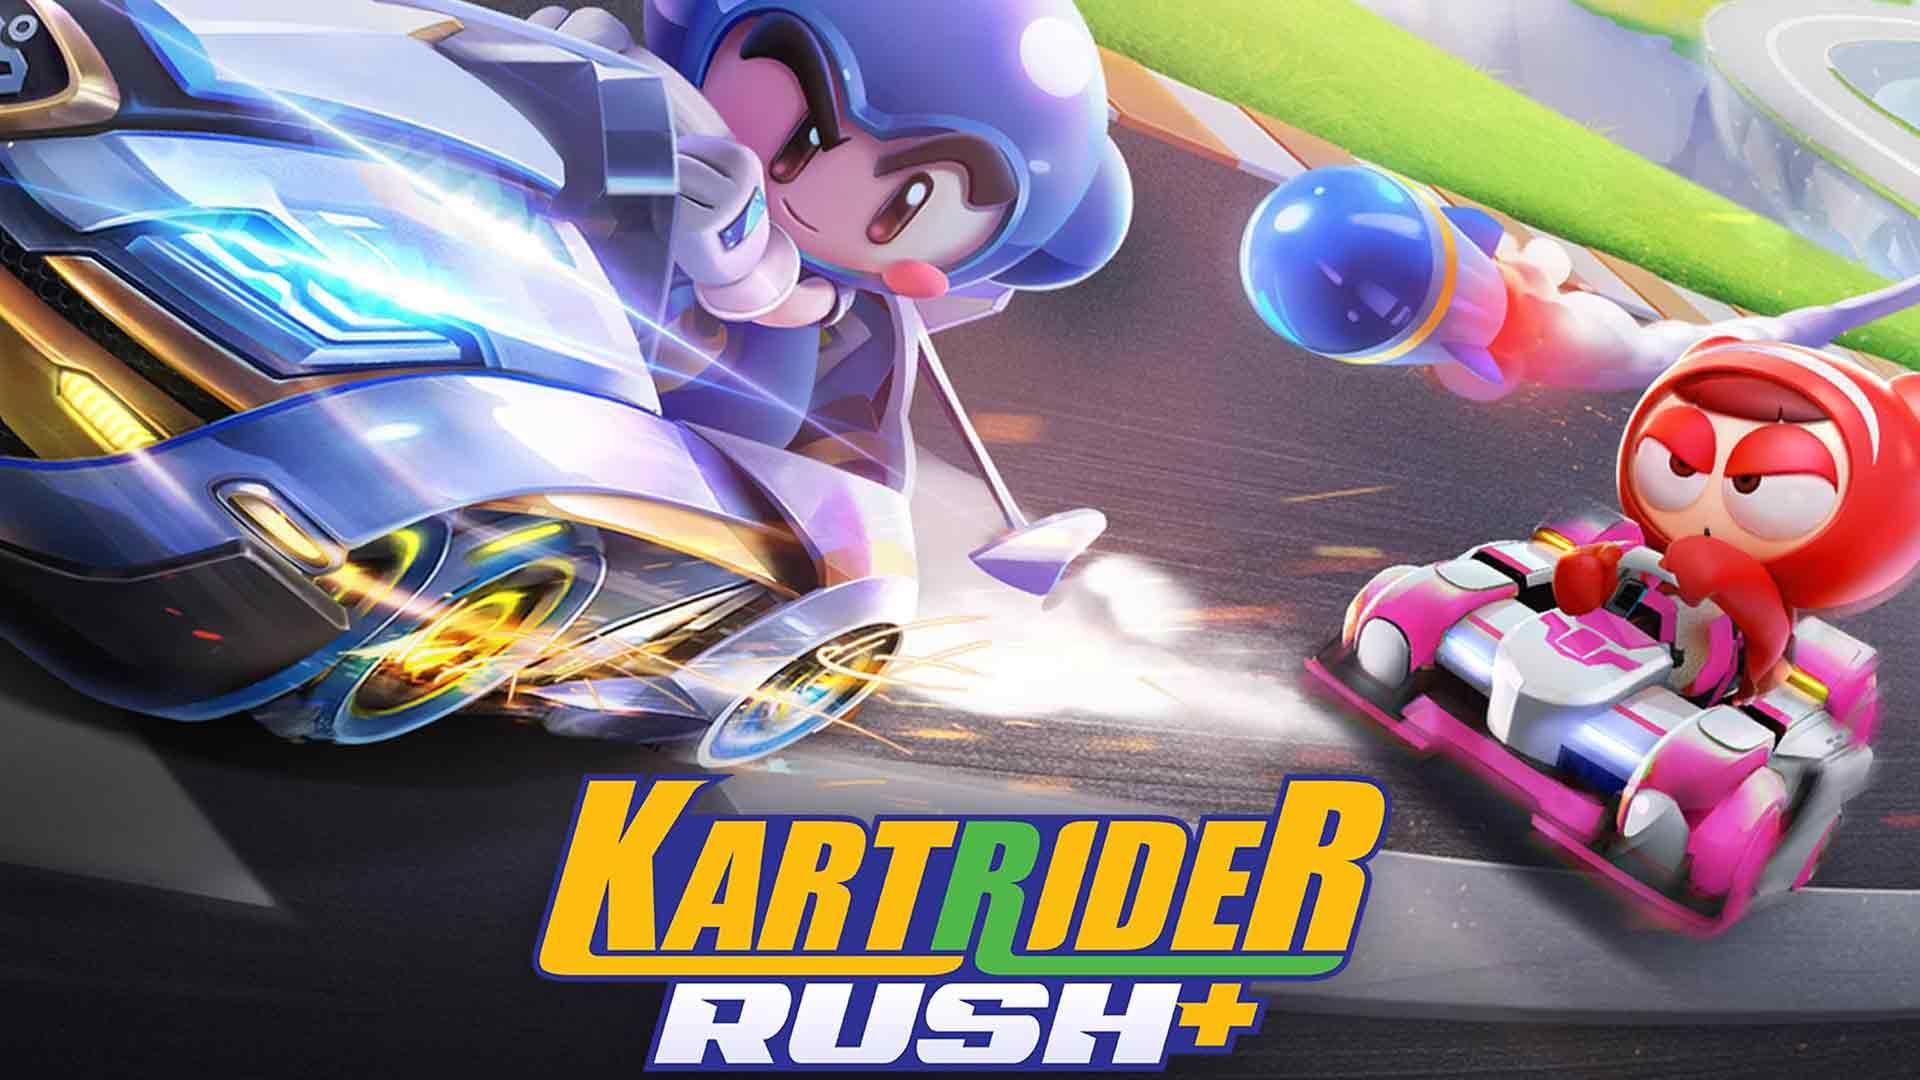 Dennis Bernardo KartRider Rush+ Interview